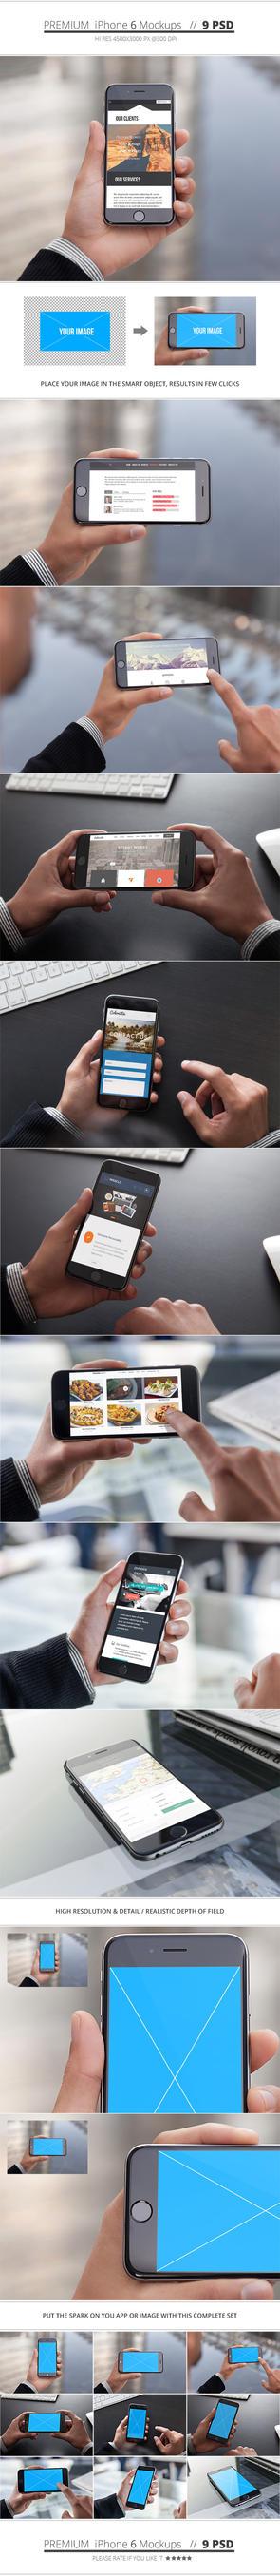 Premium iPhone 6 Mockups by NuwanP